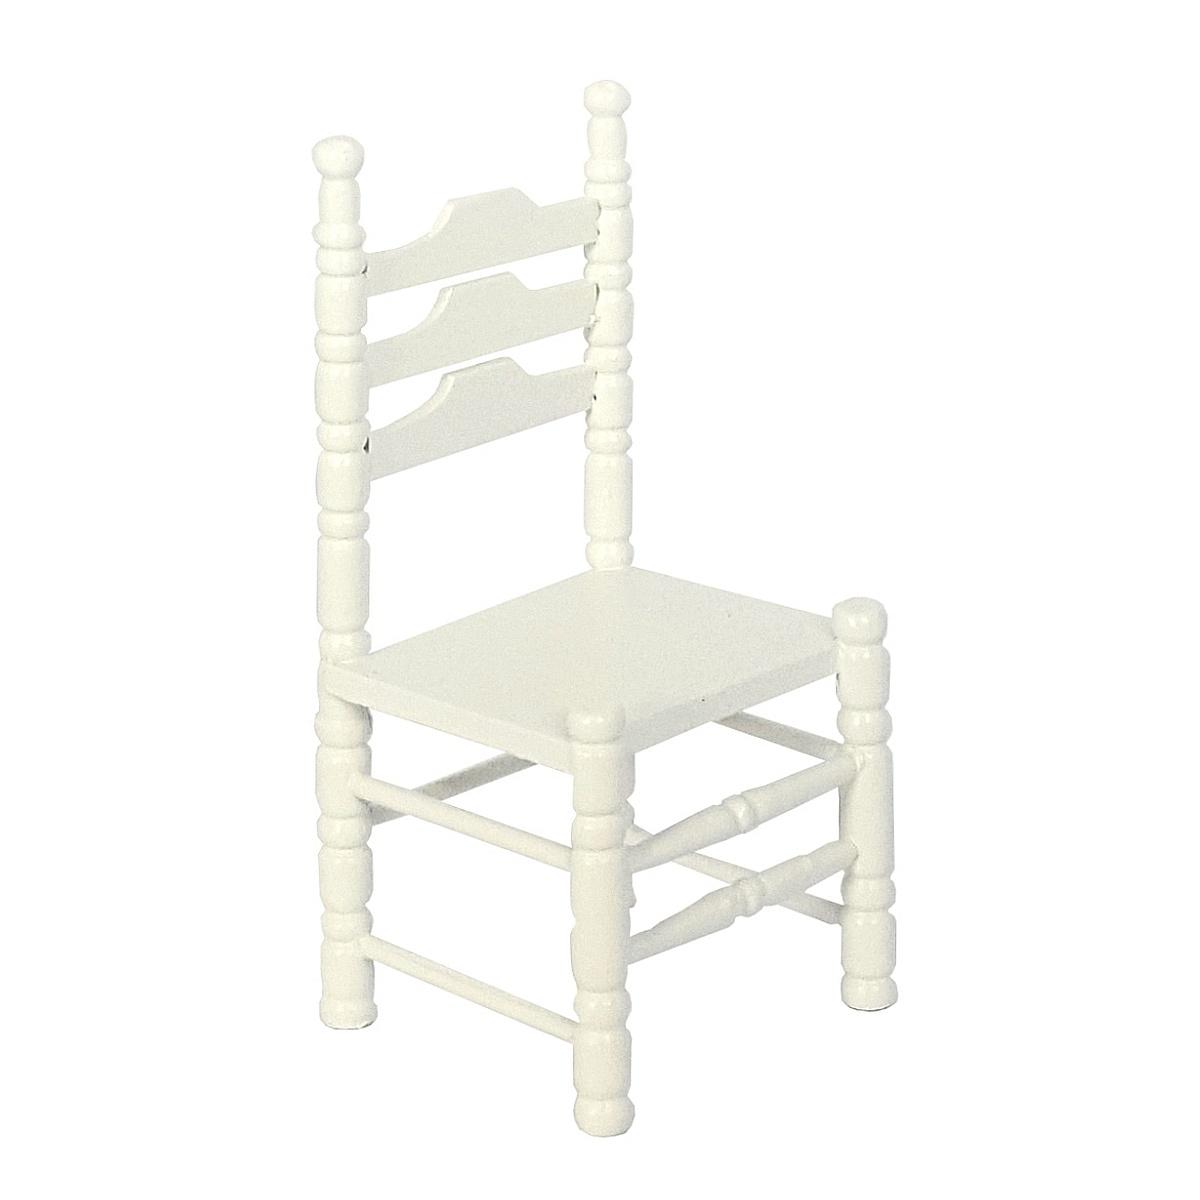 Chairs, white, 2 pcs.